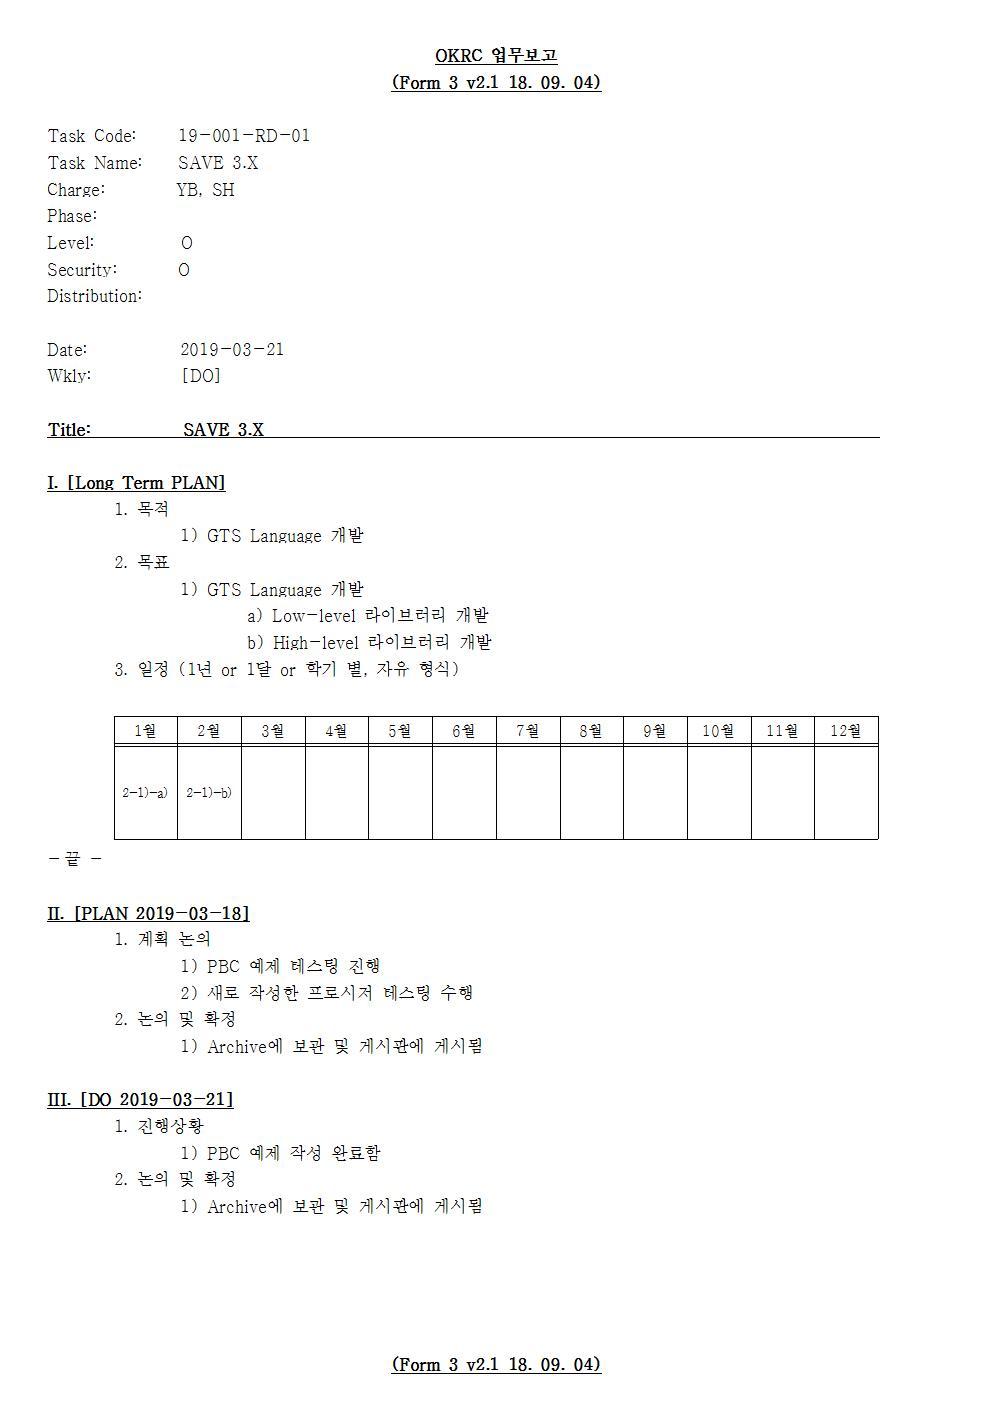 D-[19-001-RD-01]-[SAVE 3.X]-[2019-03-21][SH]001.jpg